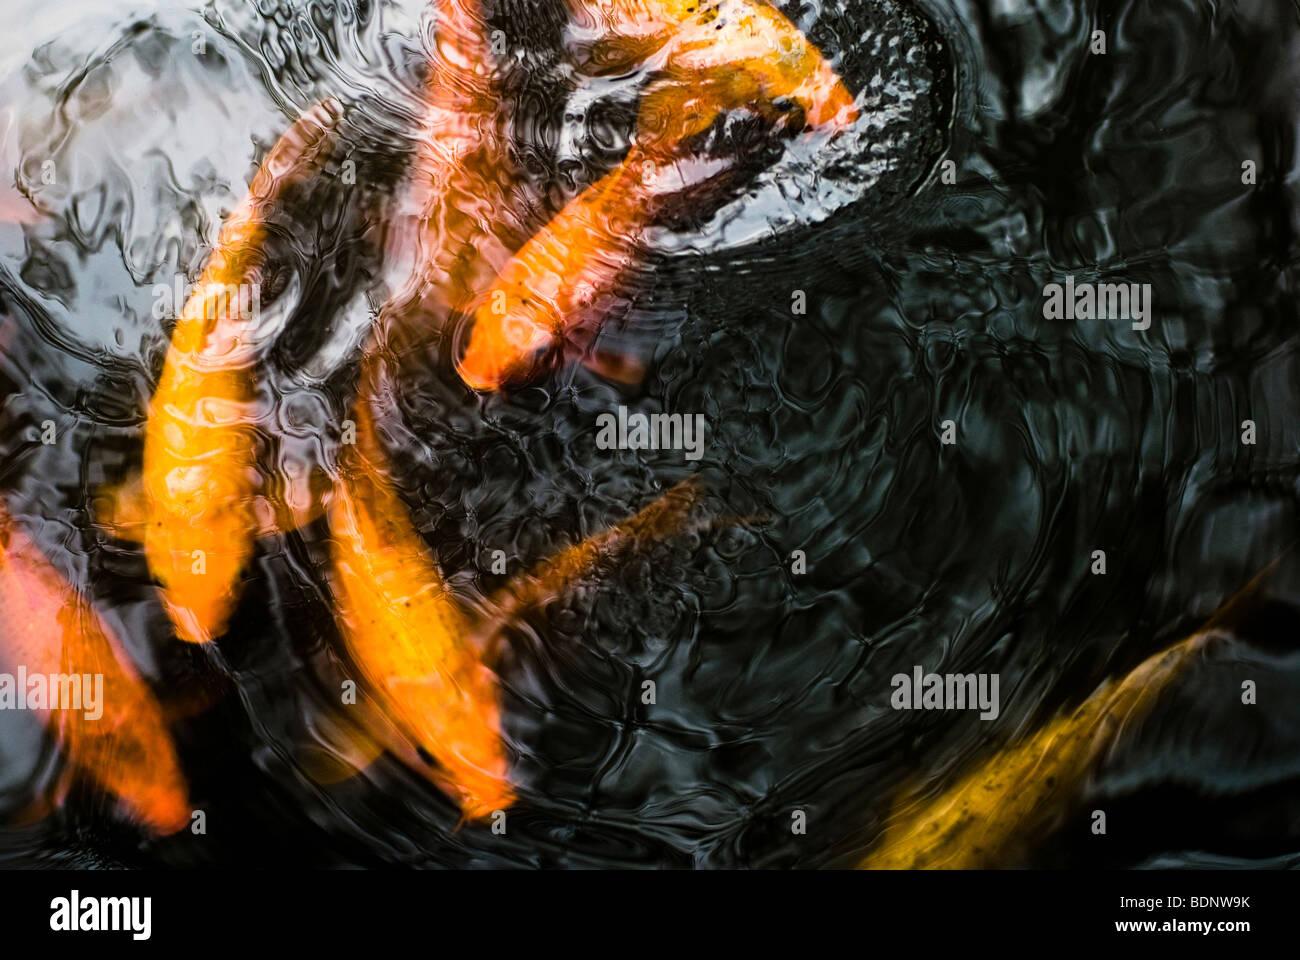 Golden Koi carp swimming in a pond - Stock Image